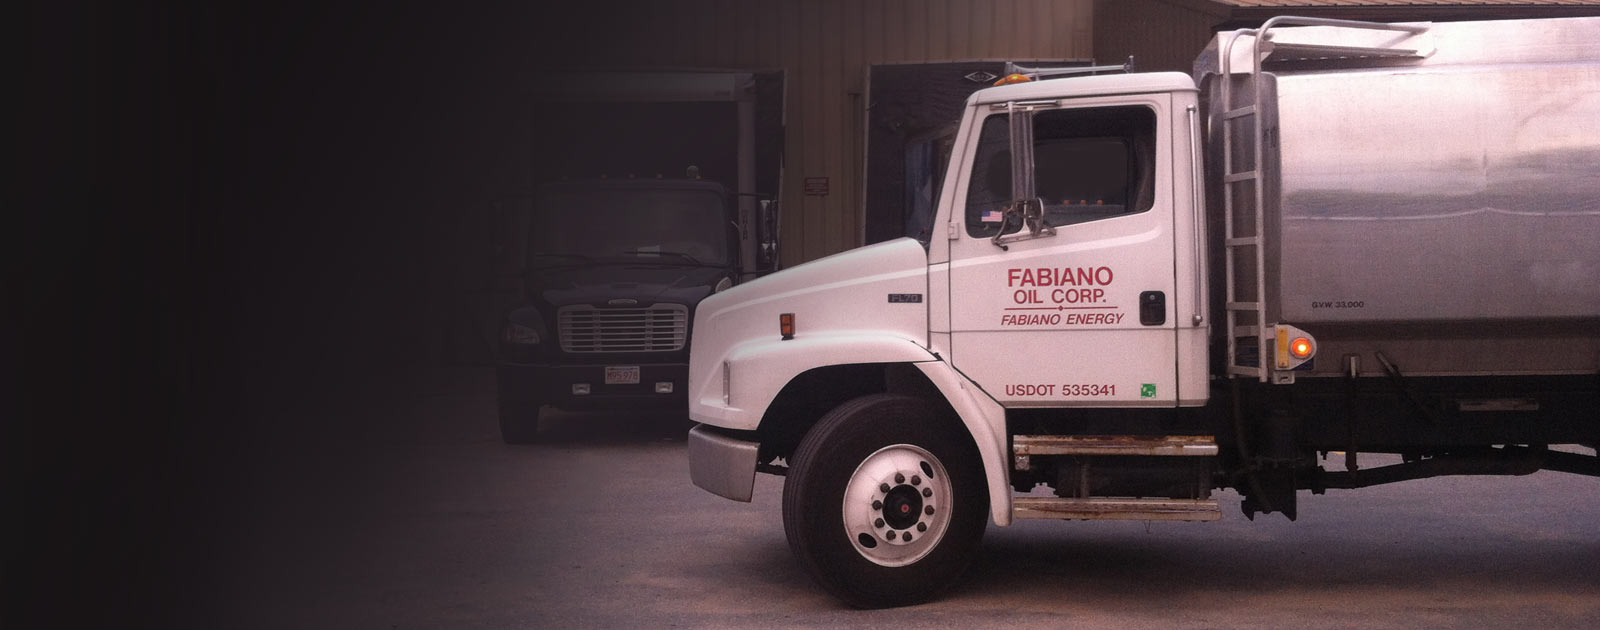 Fabiano-Energy-Diesel-Fuel